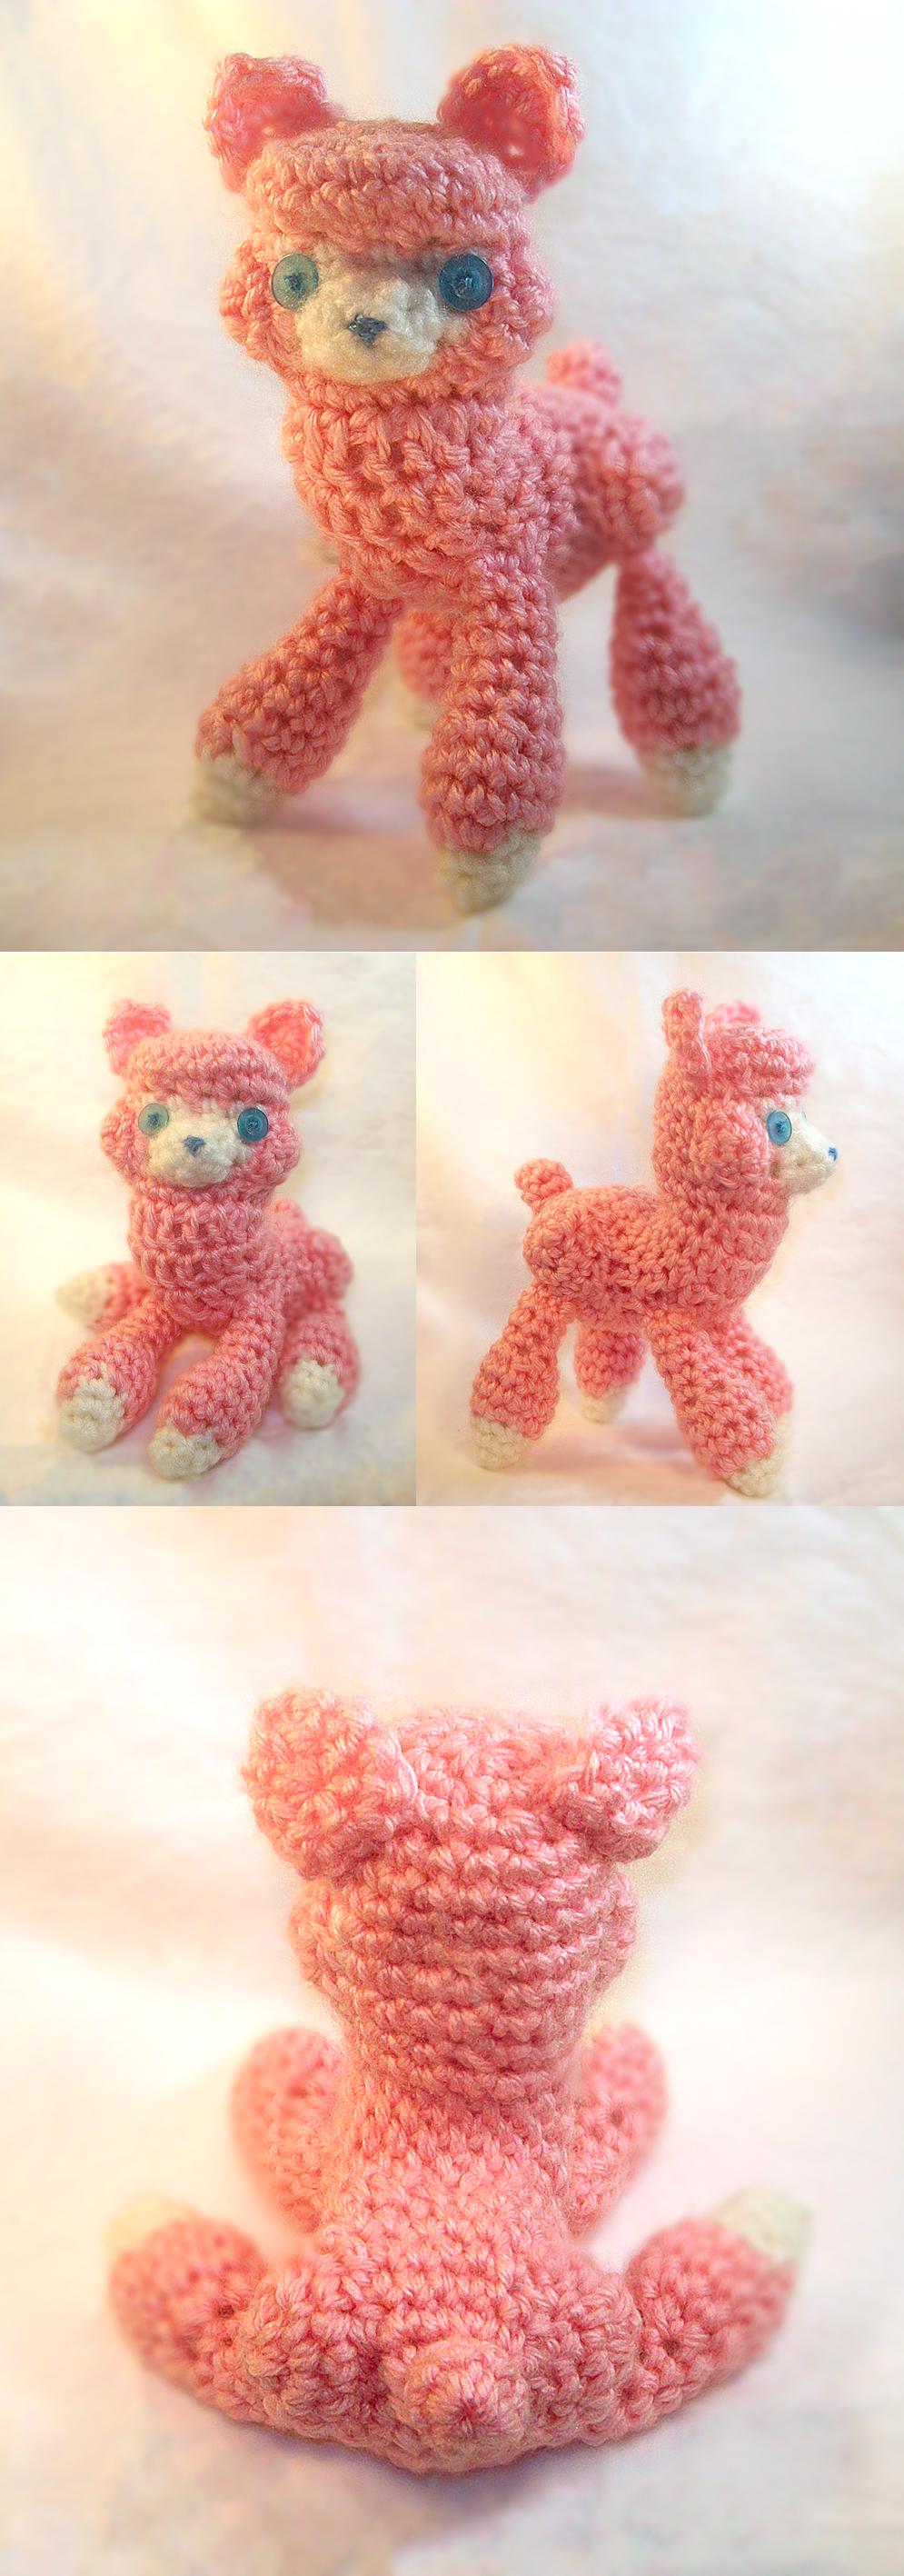 Amigurumi Alpacasso : Amigurumi Alpaca by RainbowReverie on DeviantArt